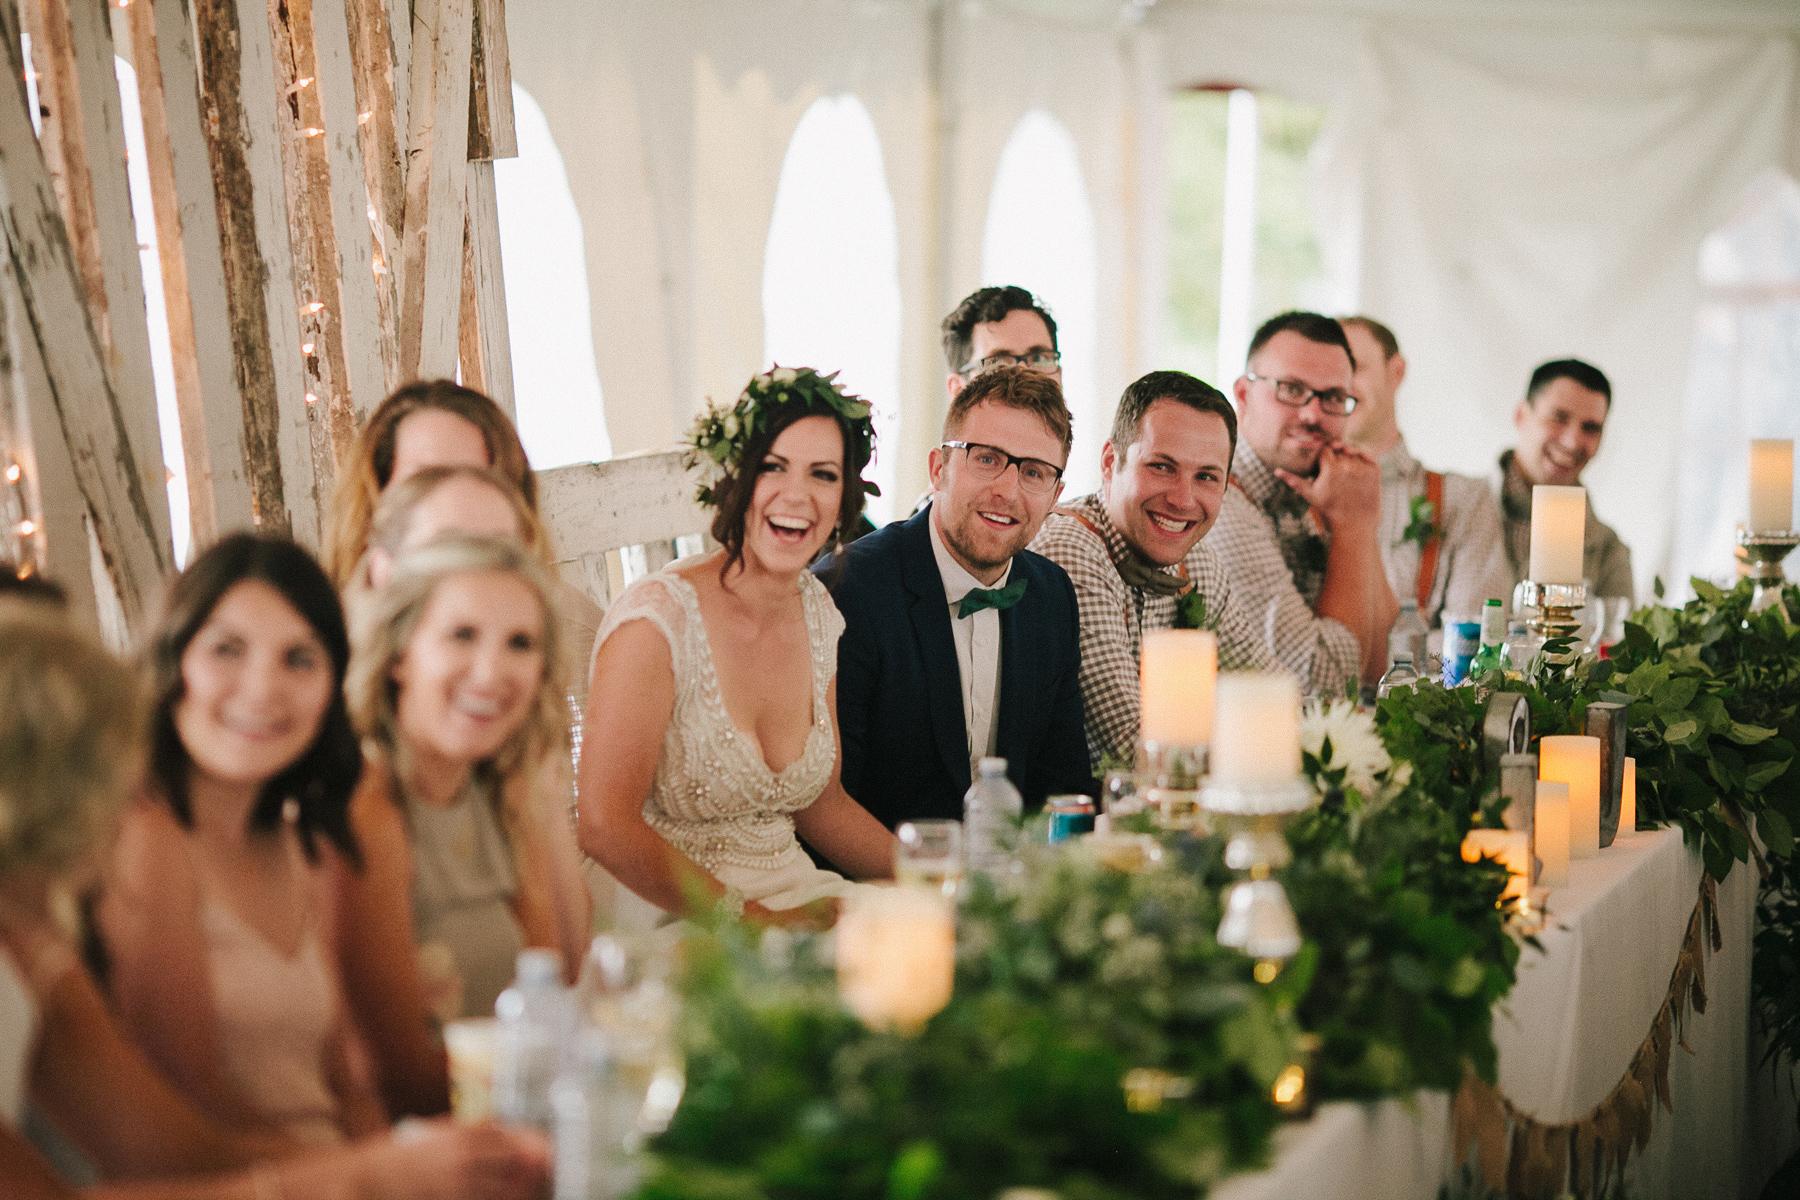 alberta-farm-wedding-photographer-rp-wj-207.jpg